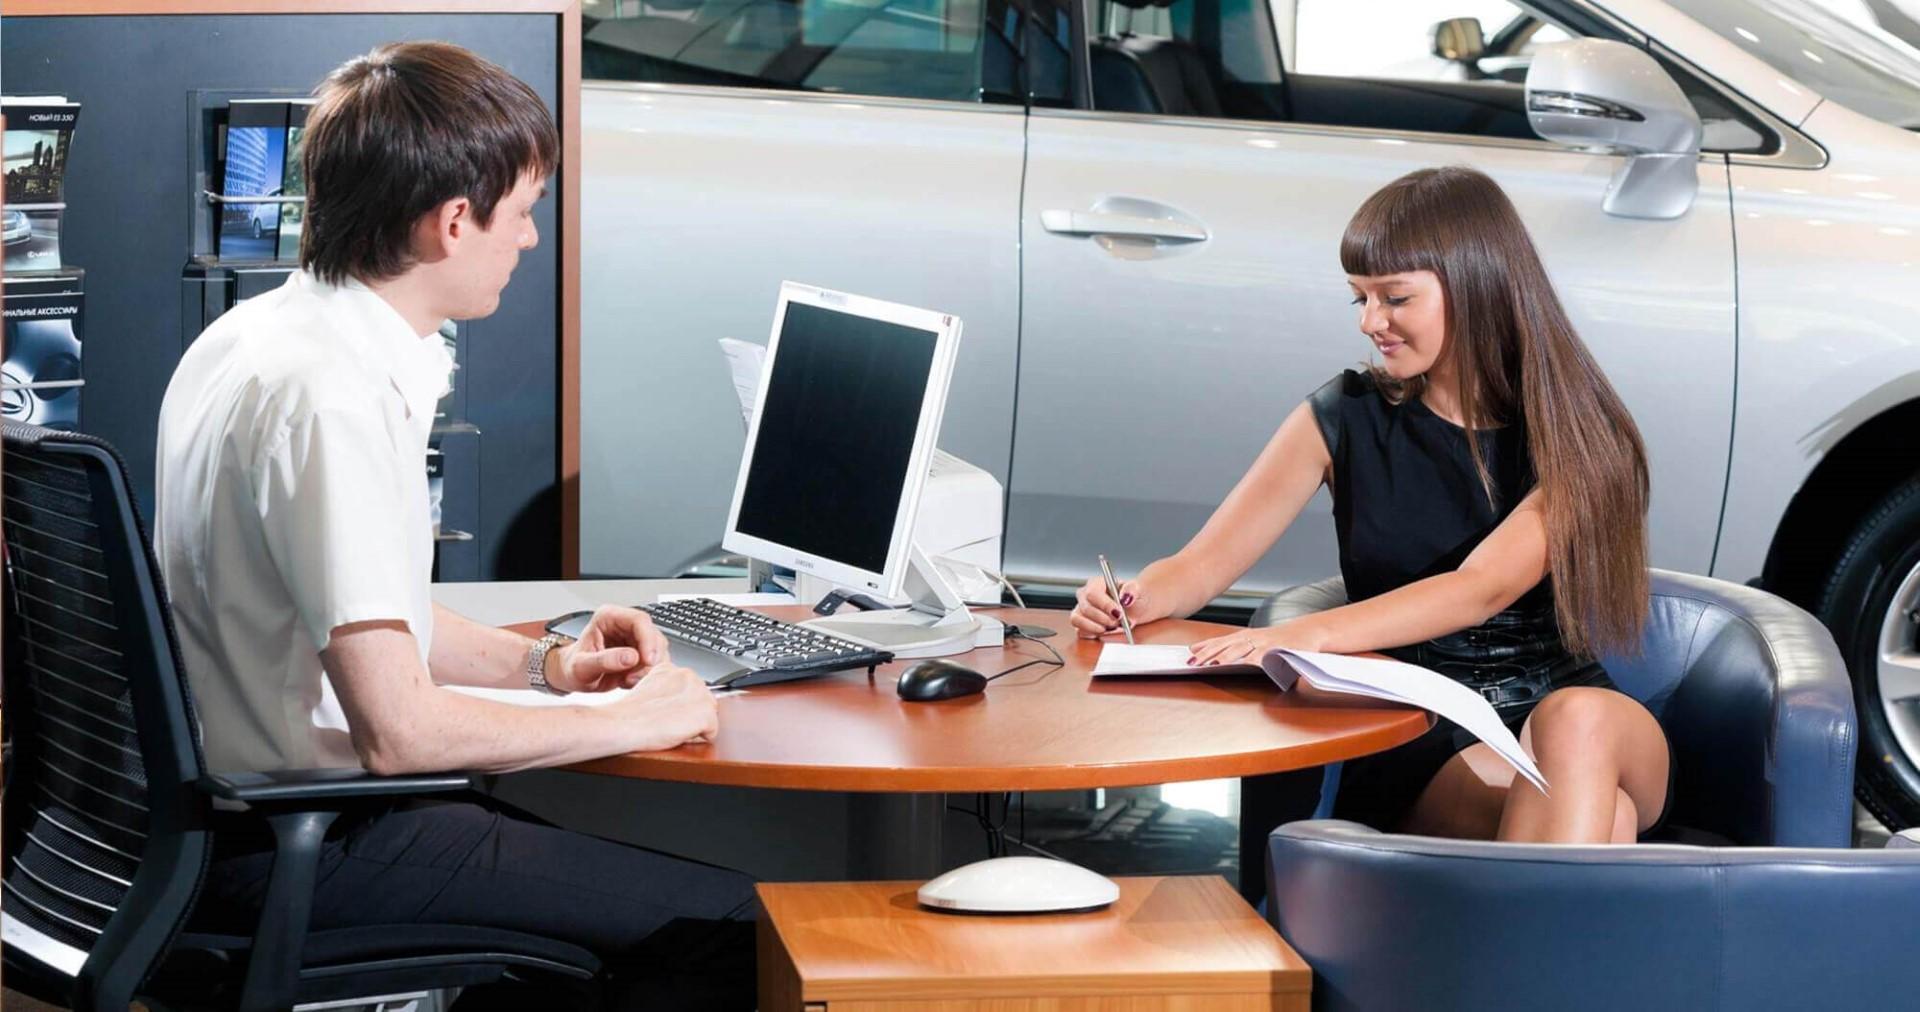 Договор покупки автомобиля в автосалоне